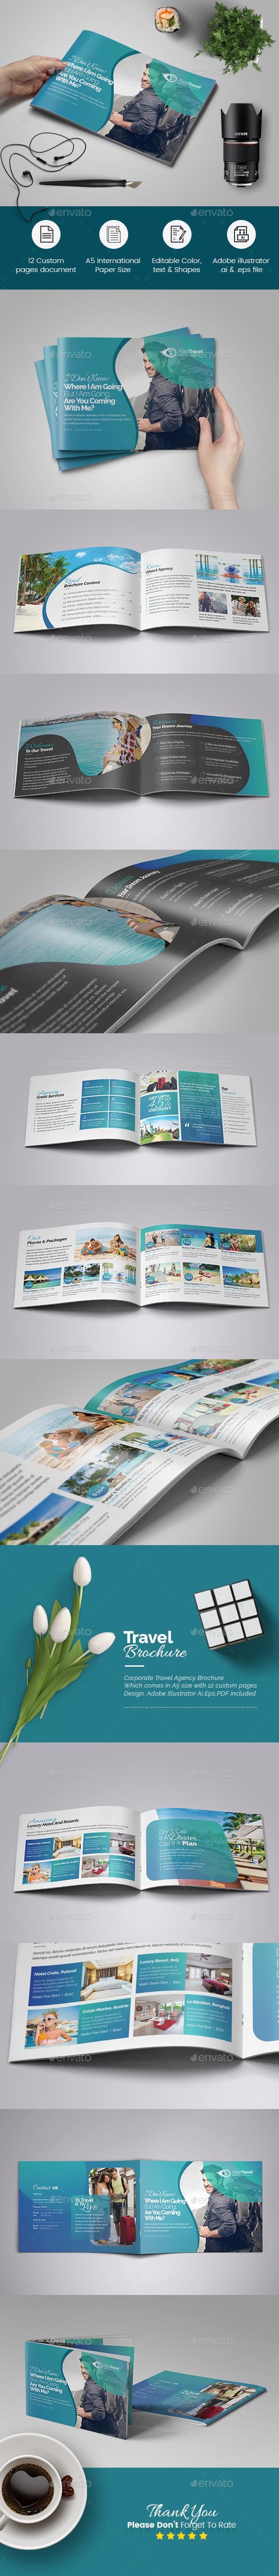 Travel Agency Brochure - Corporate Brochures